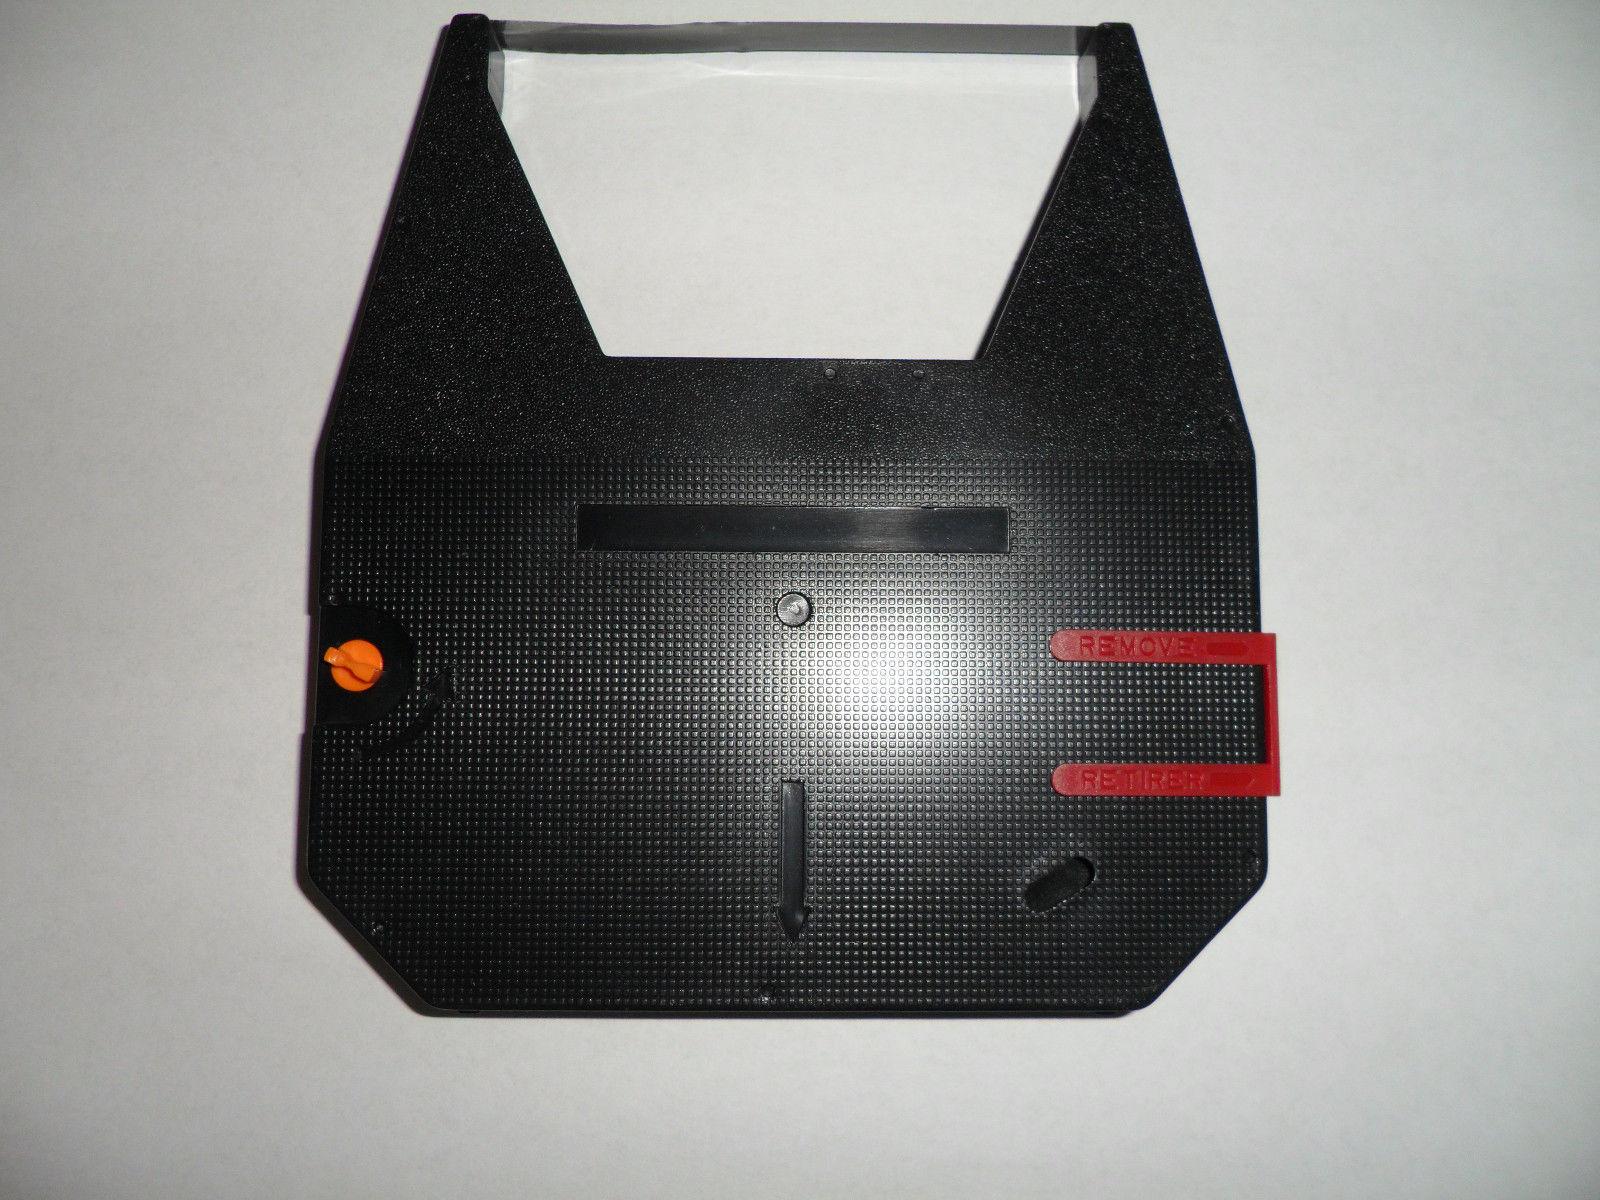 Brother HR-15/HR-15XL/HR-20/HR-25 Typewriter Ribbon Replaces 7020 B165 T330